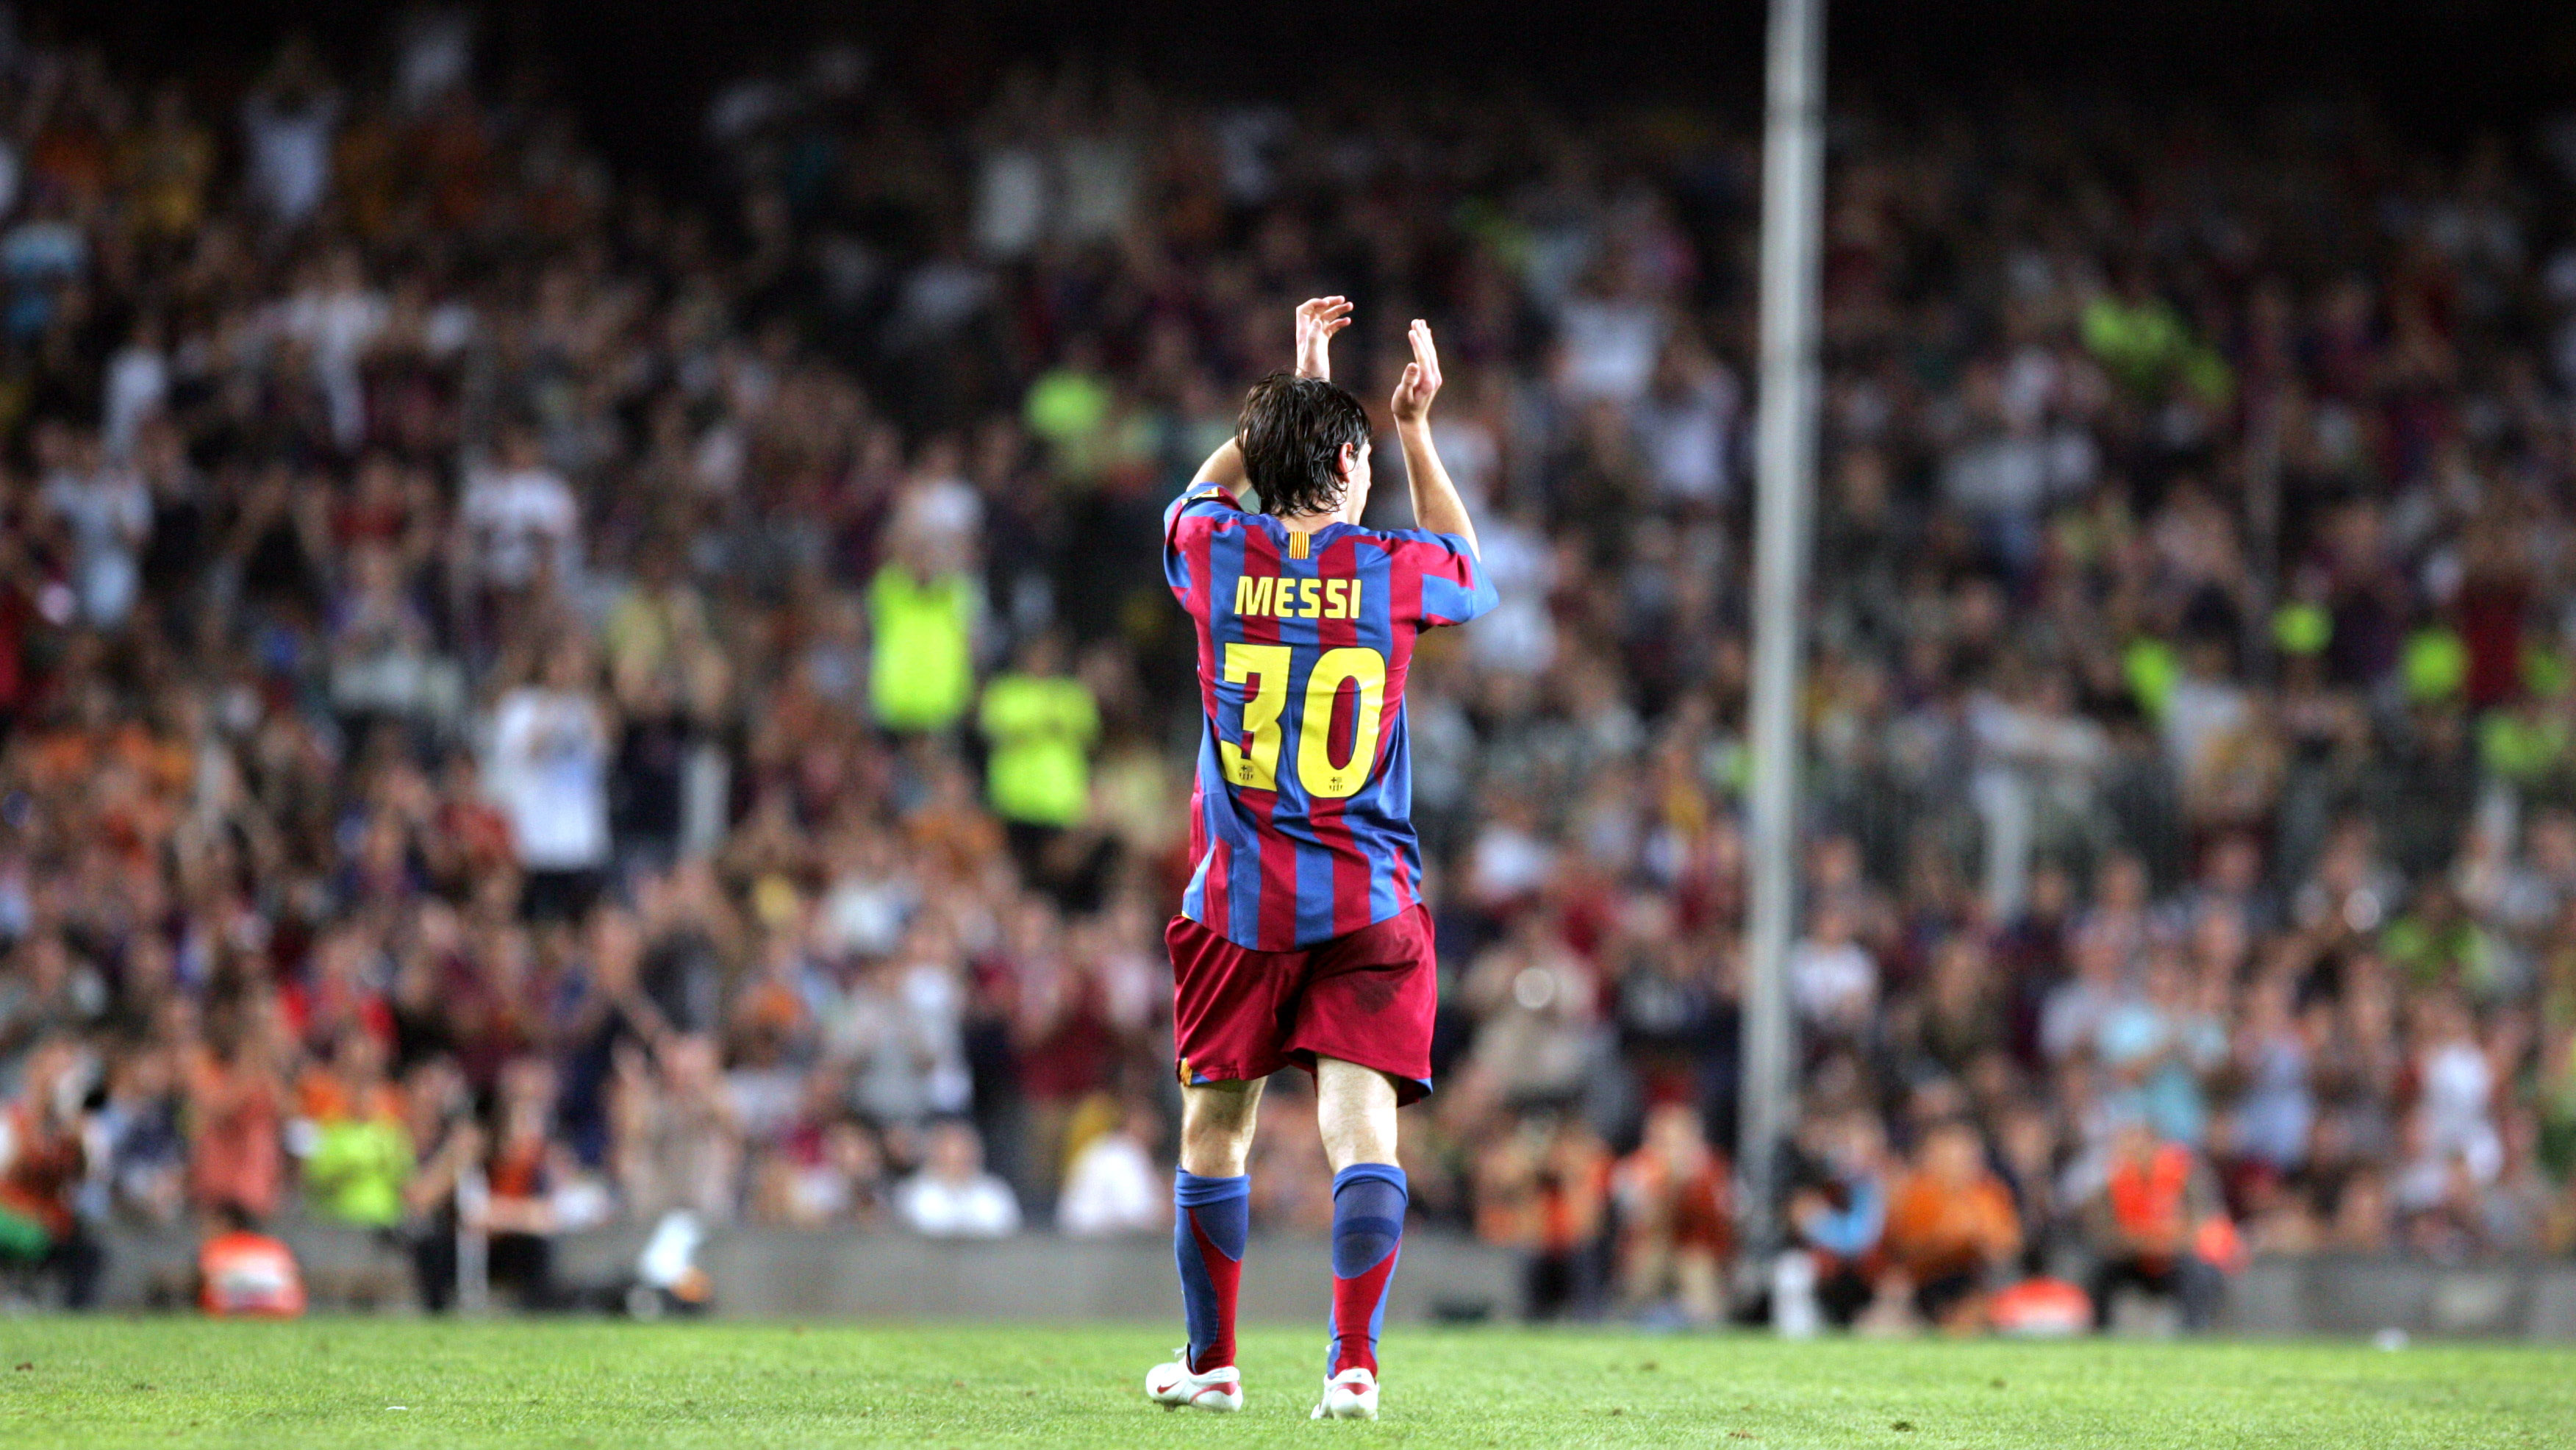 http://media4.fcbarcelona.com/media/asset_publics/resources/000/161/801/original/pic_24-08-05_Messi_cambio_01.v1431602069.JPG